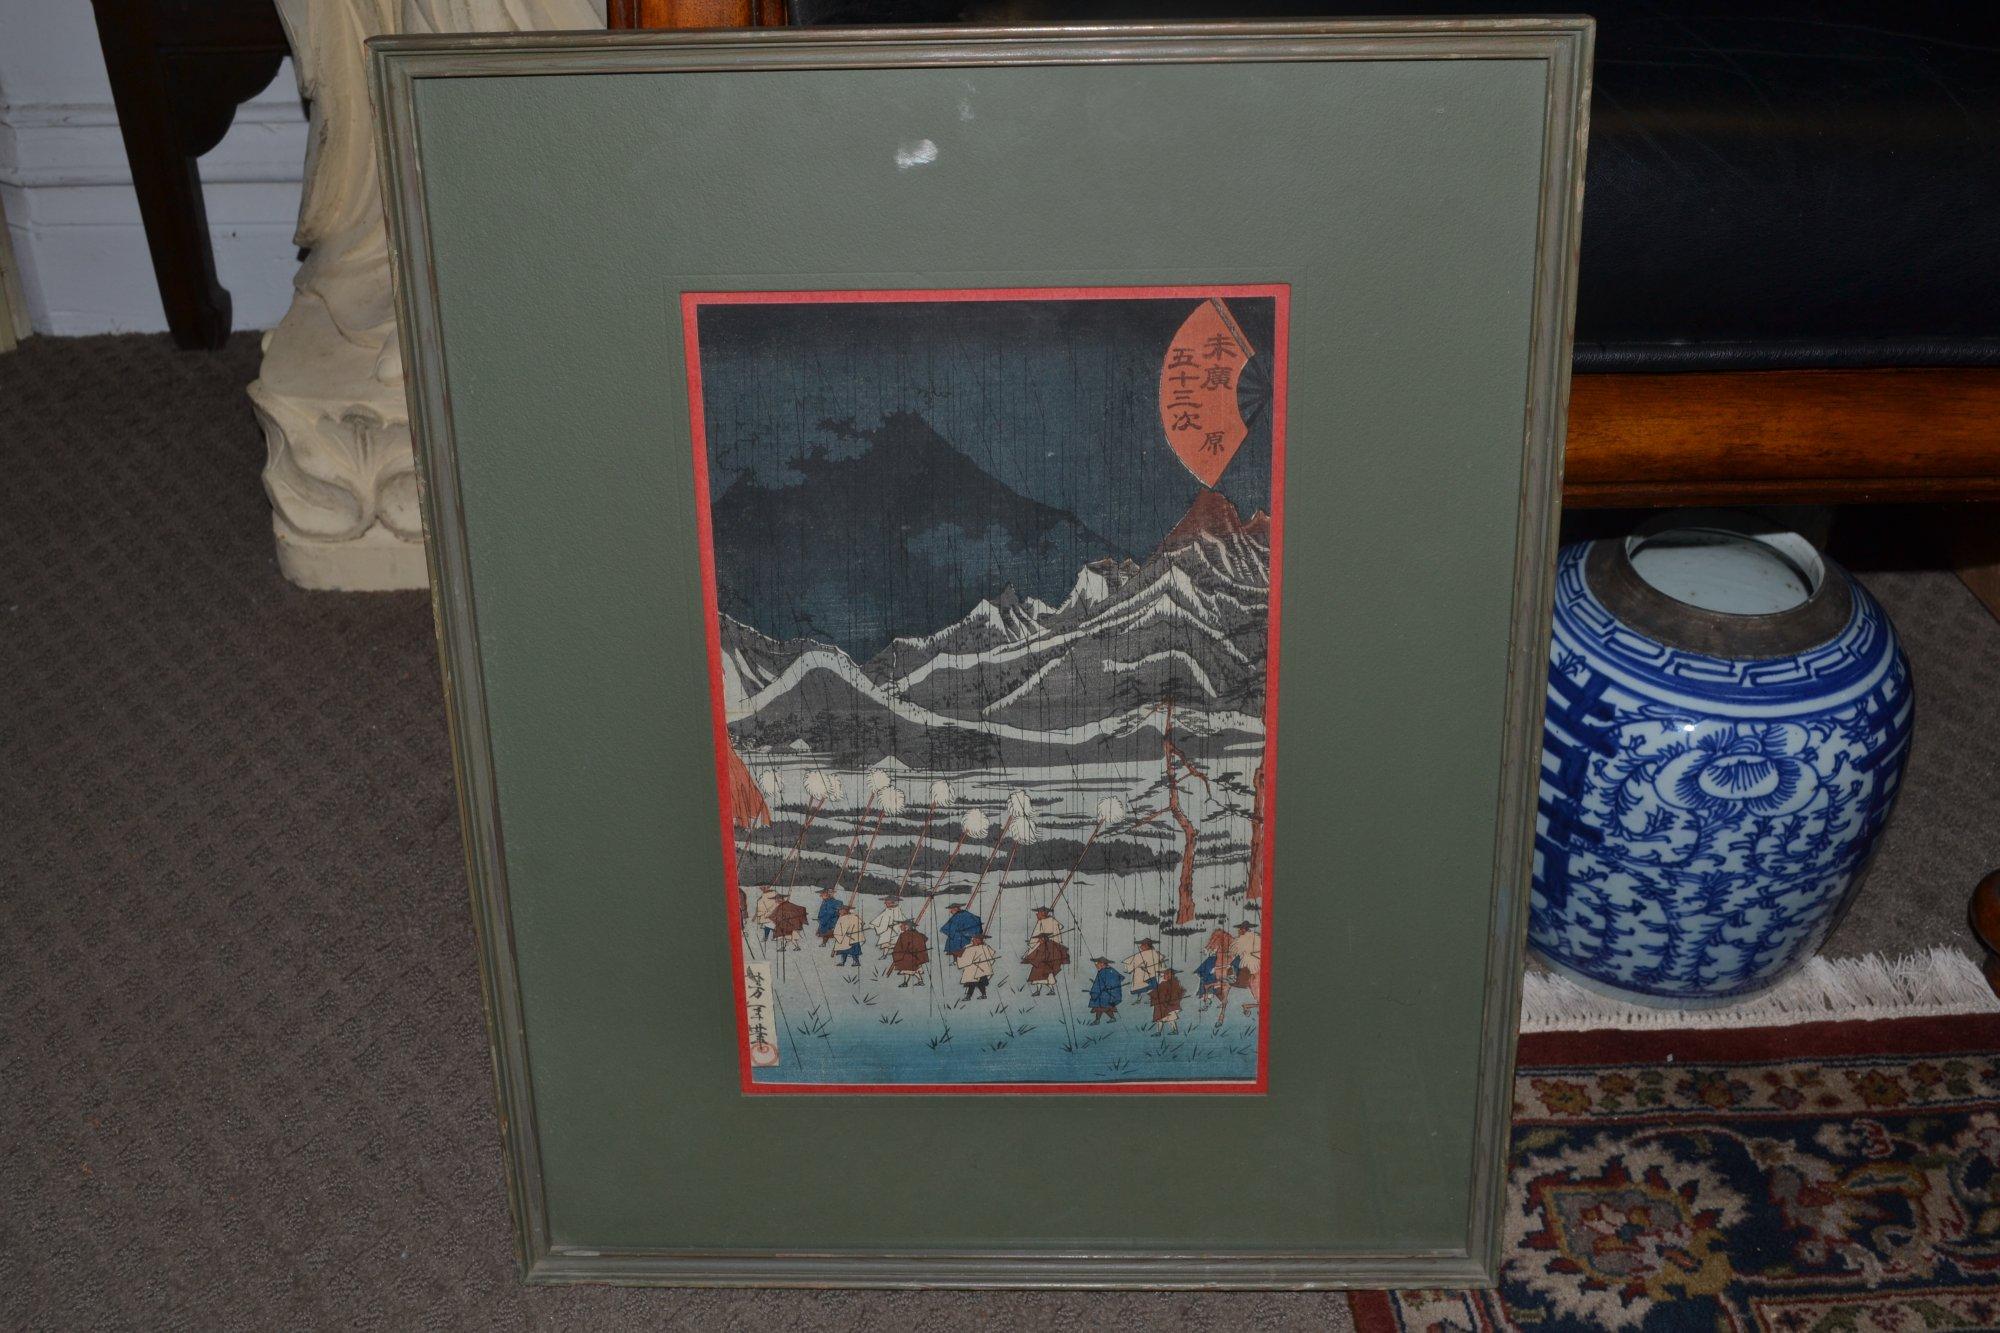 19th Century Japanese Woodblock Print, Titled Hara by Tsukioka Yoshitoshi